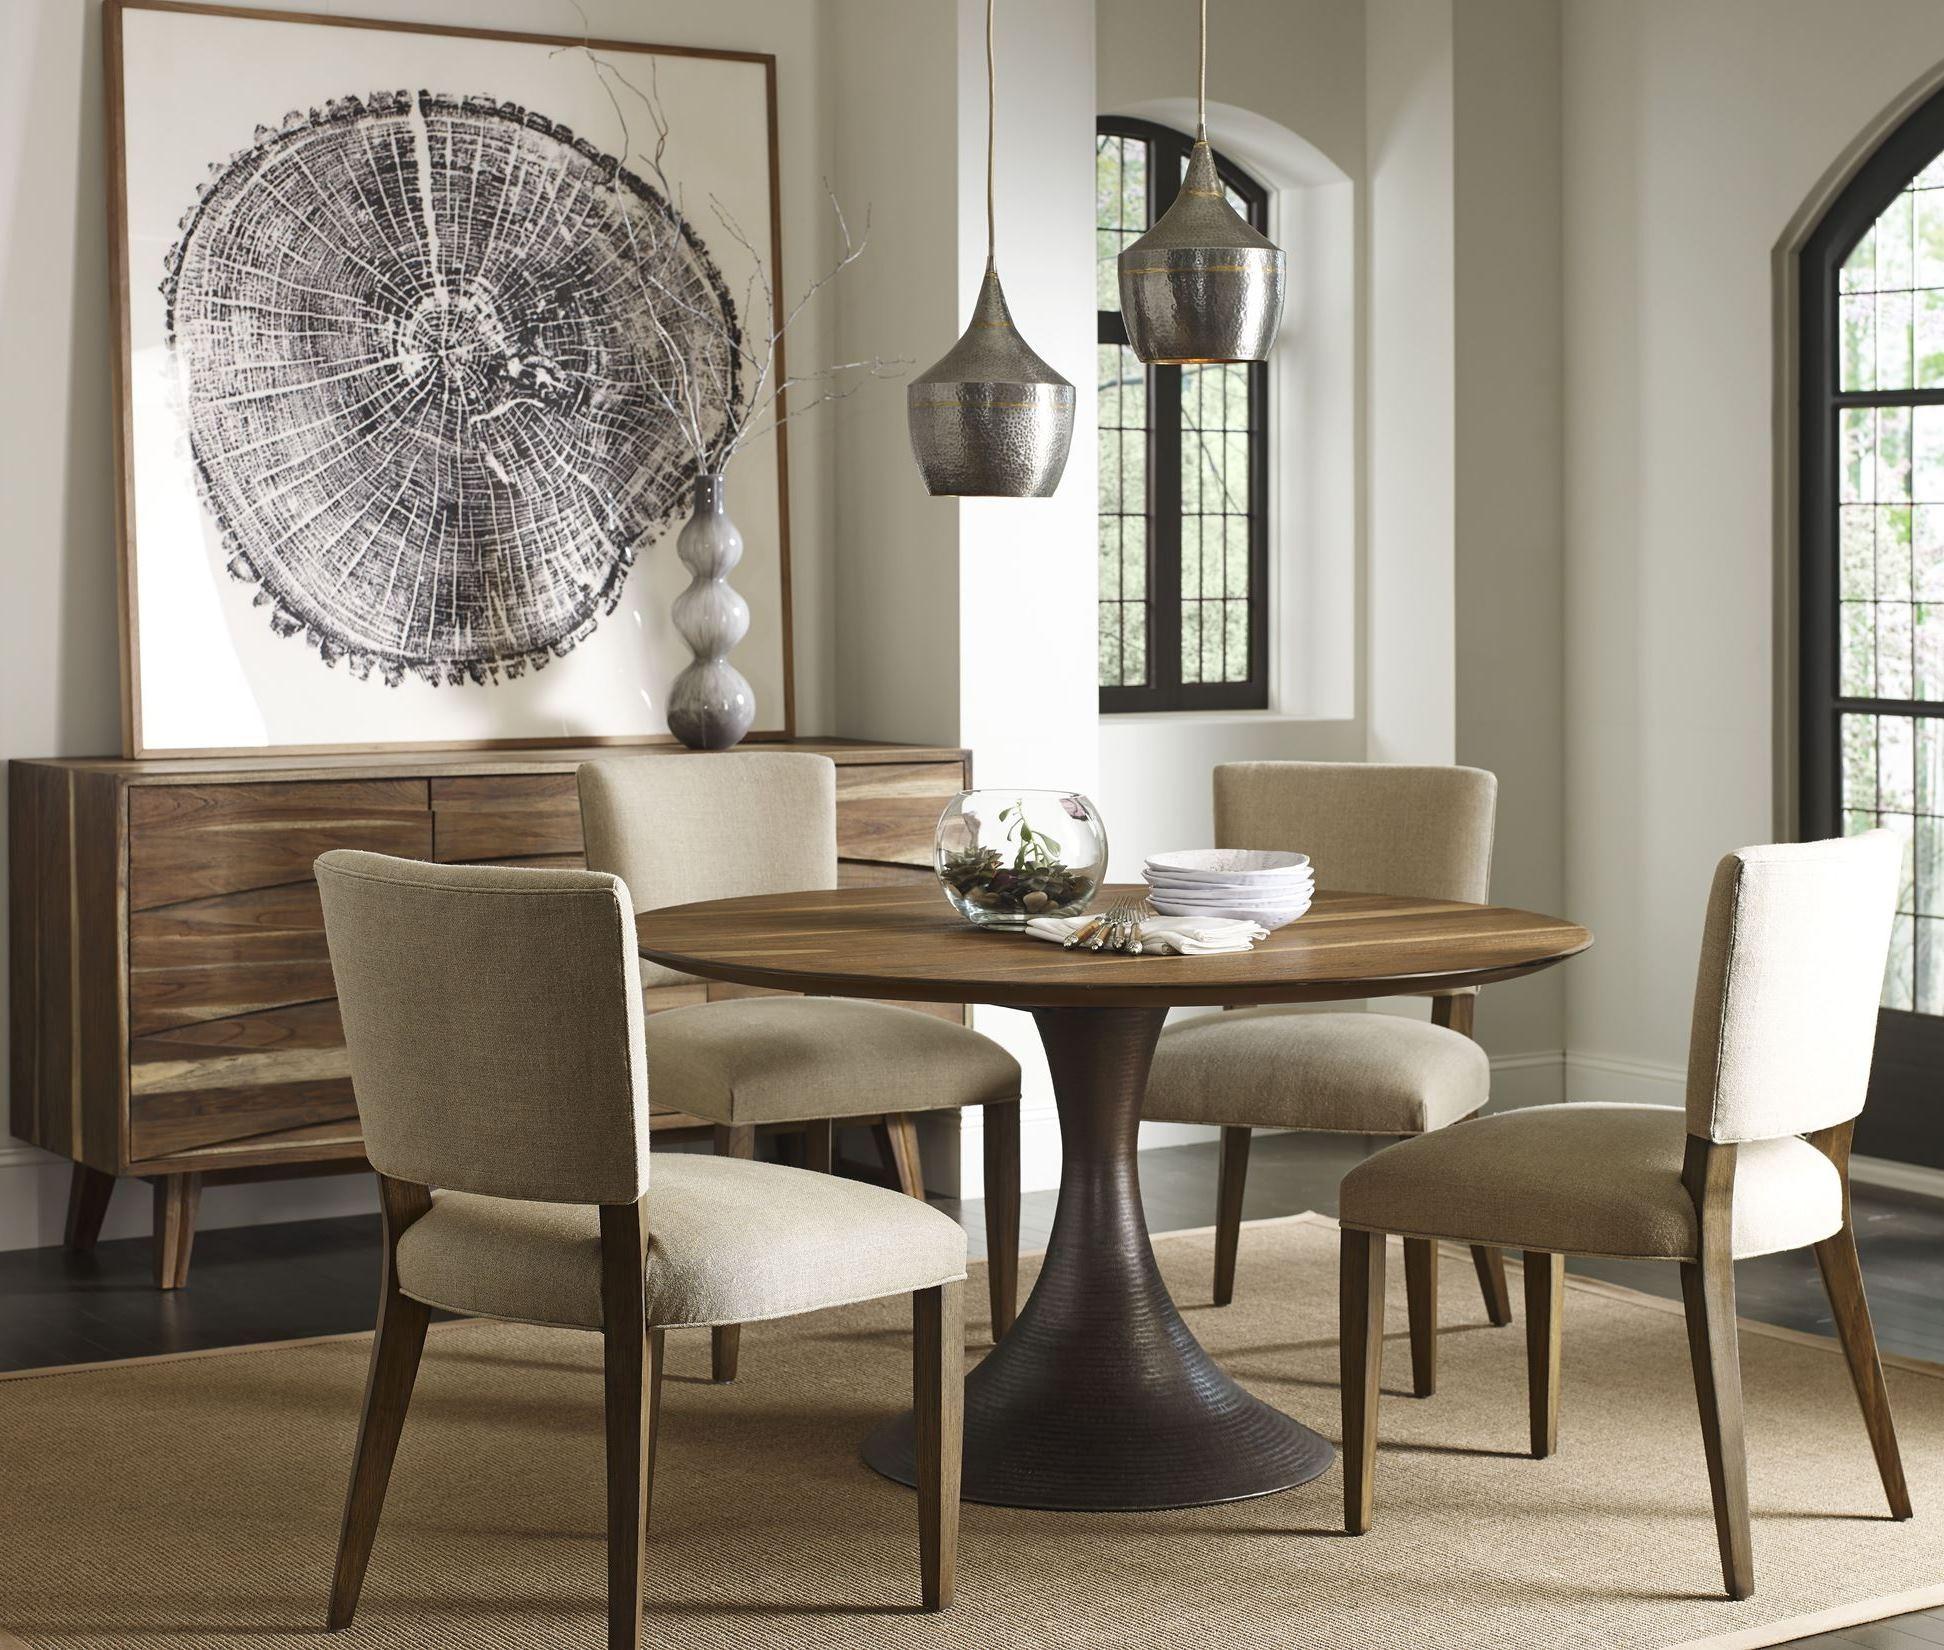 casablanca walnut round dining room set caw301t ca301ab